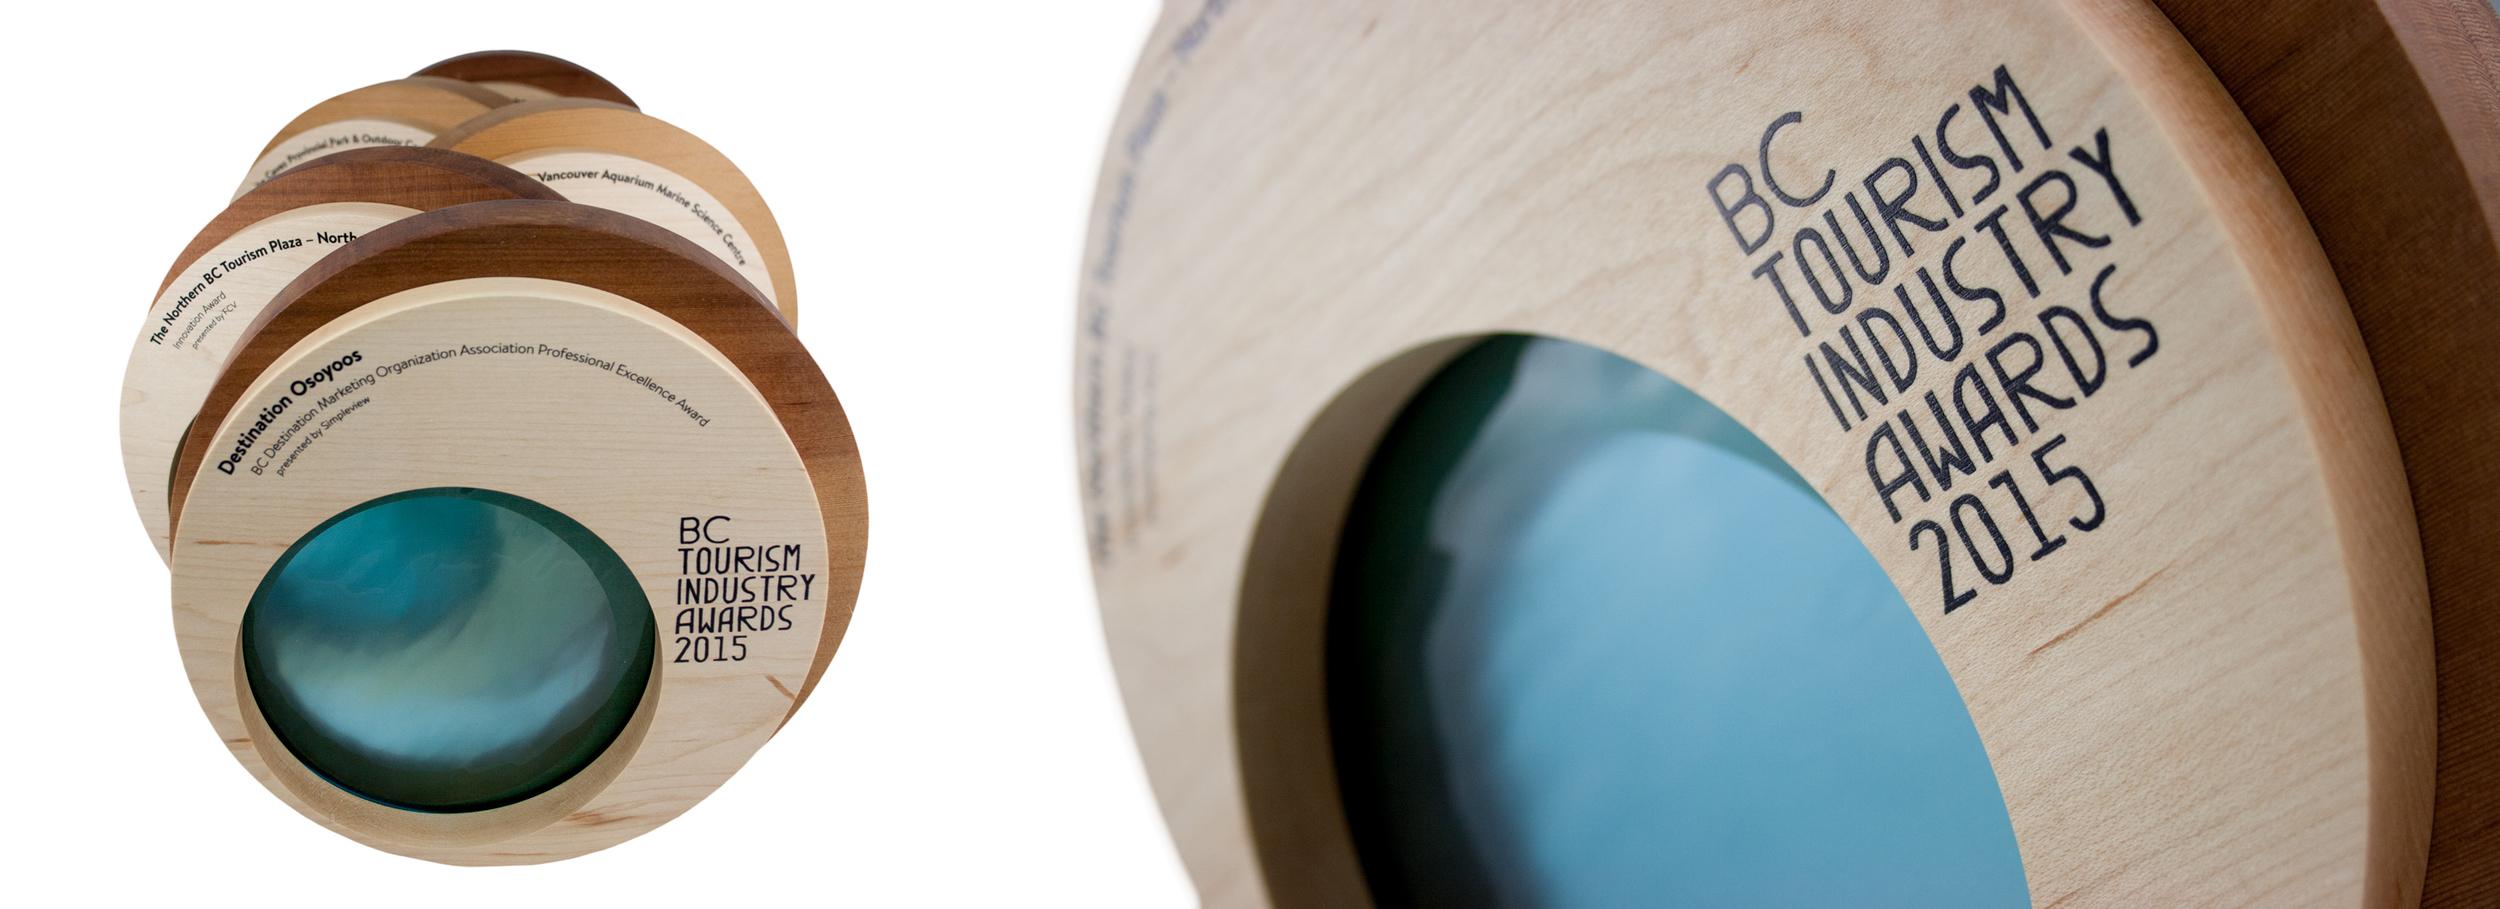 bc tourism industry awards custom creative eco design wood trophy